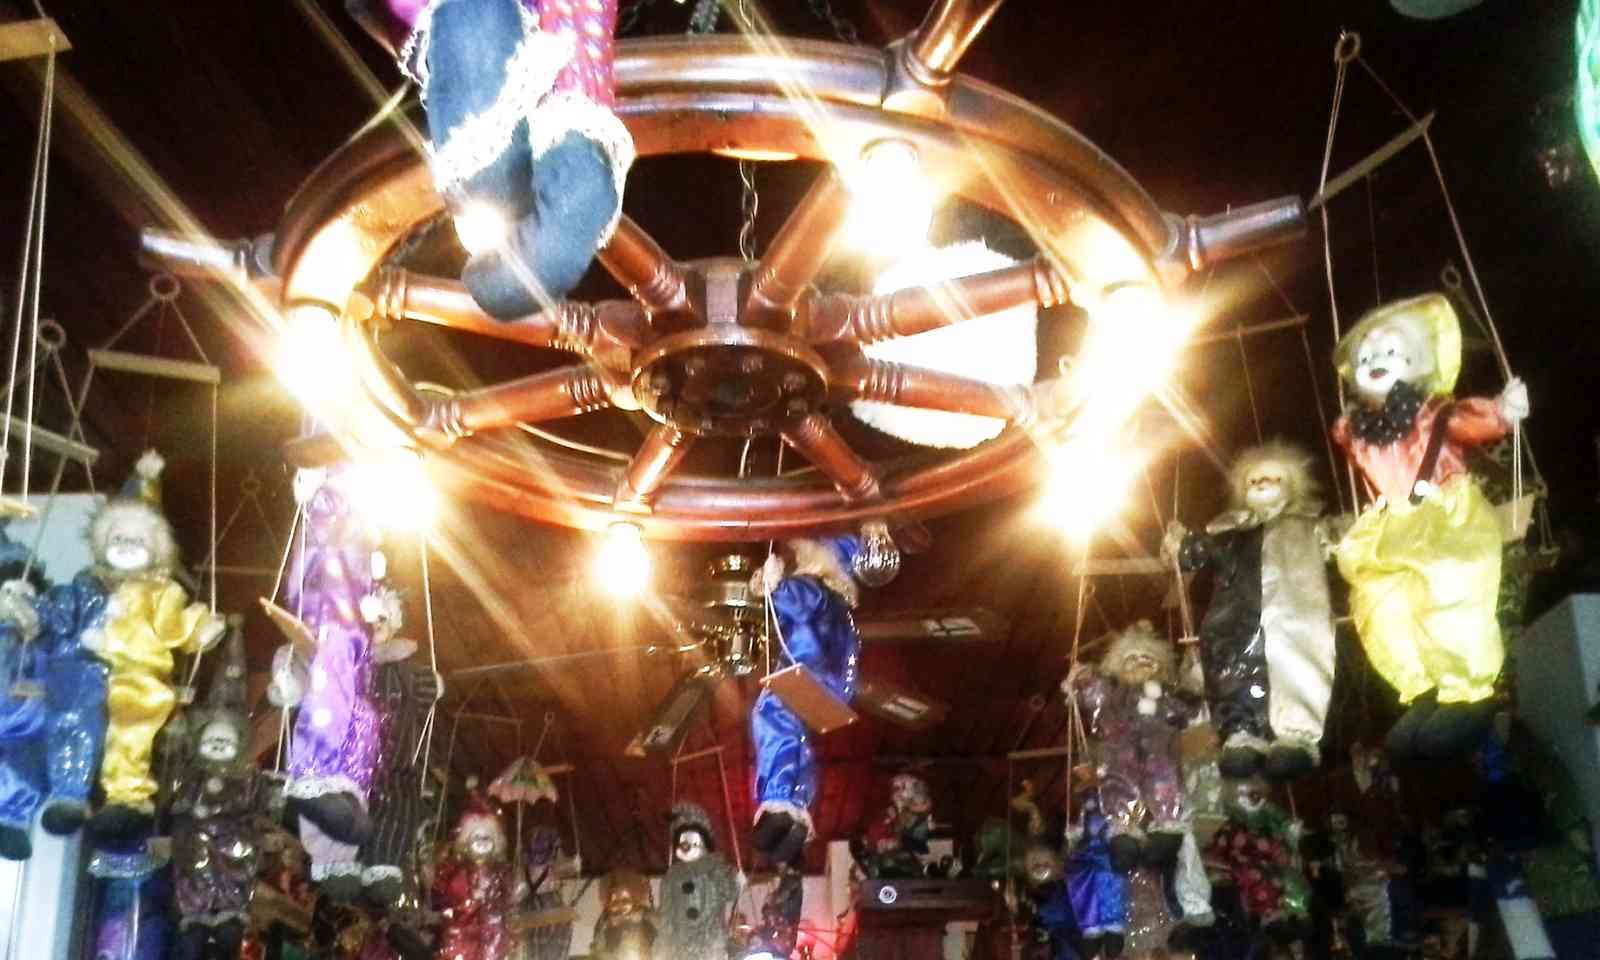 Cirkuskroen (The Circus Pub) (European Capital of Culture Aarhus 2017)